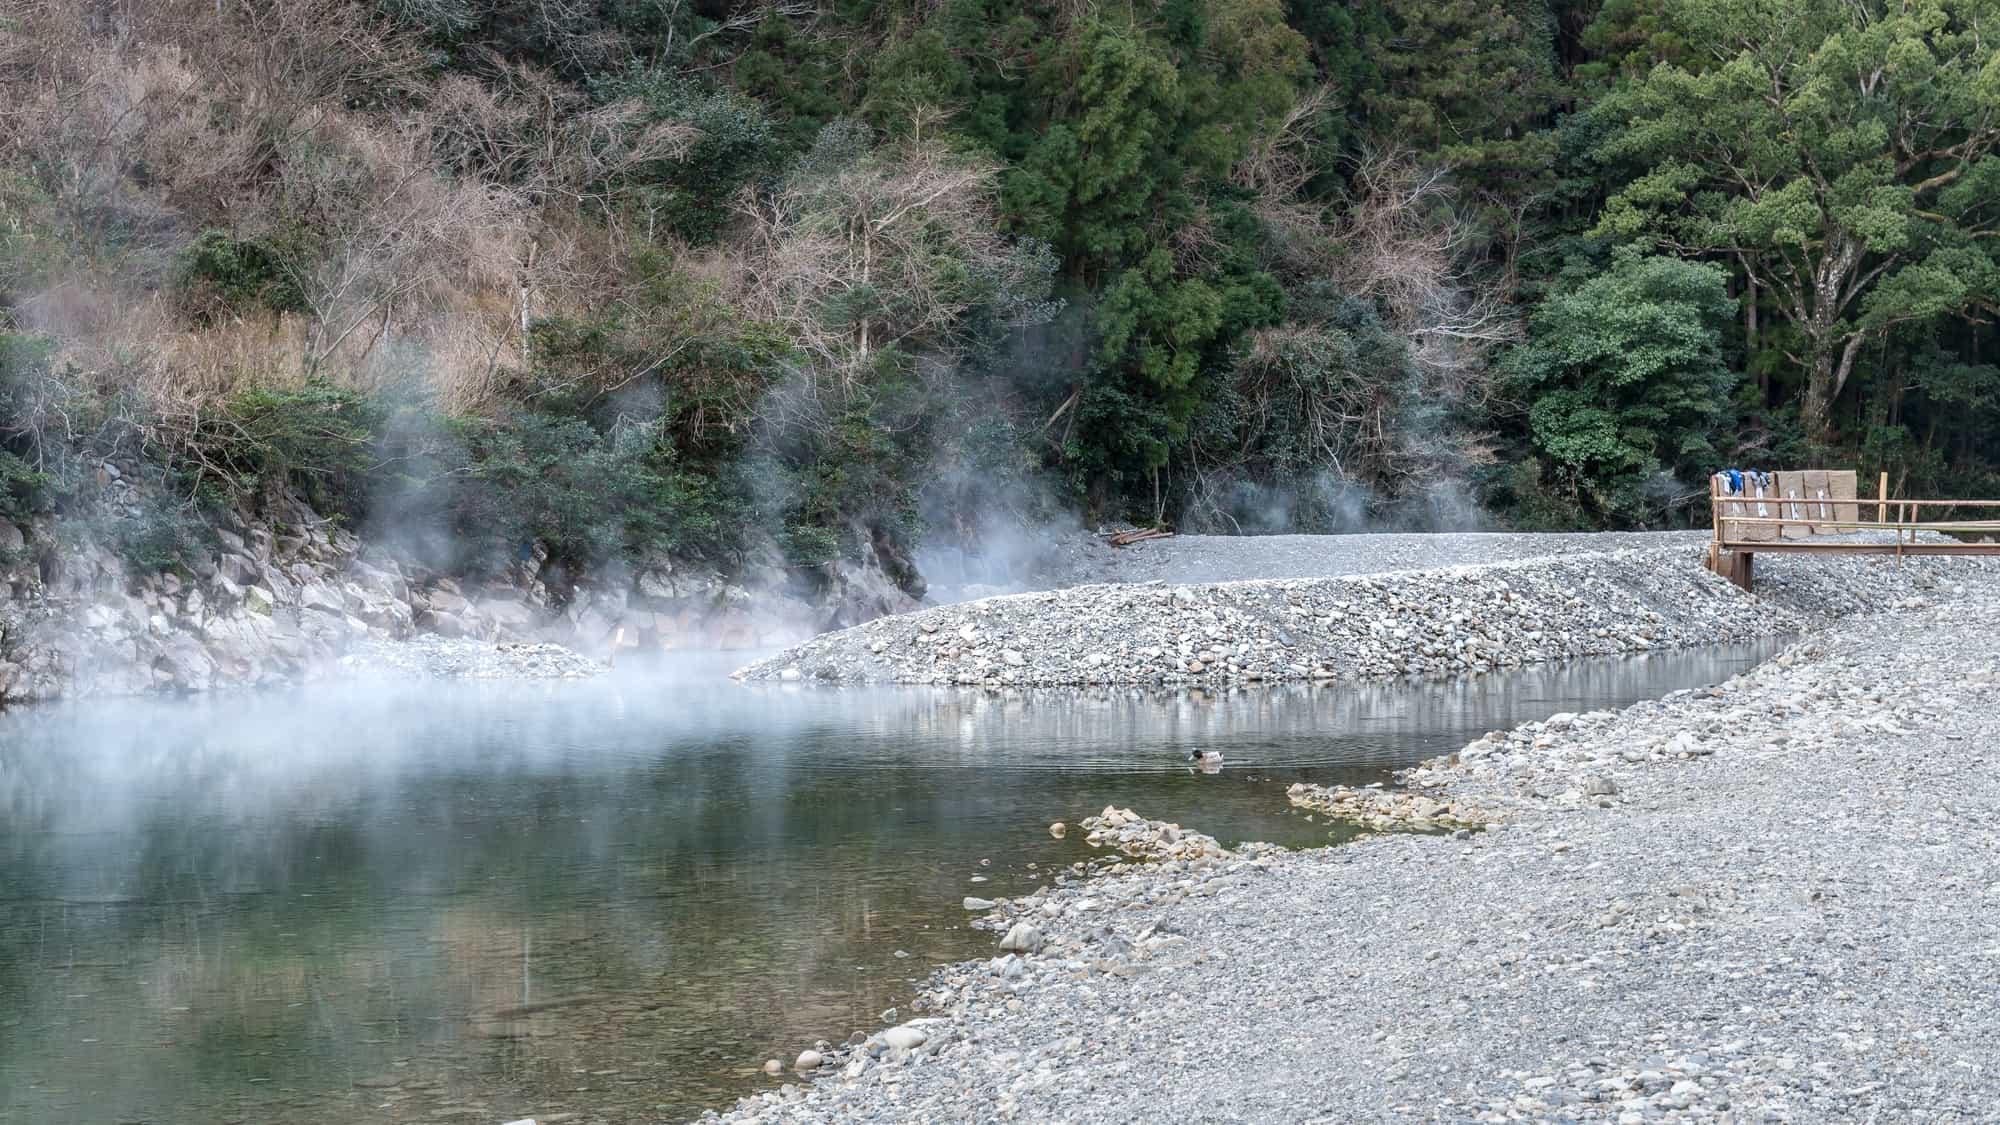 Kawayu Onsen's steamy bath